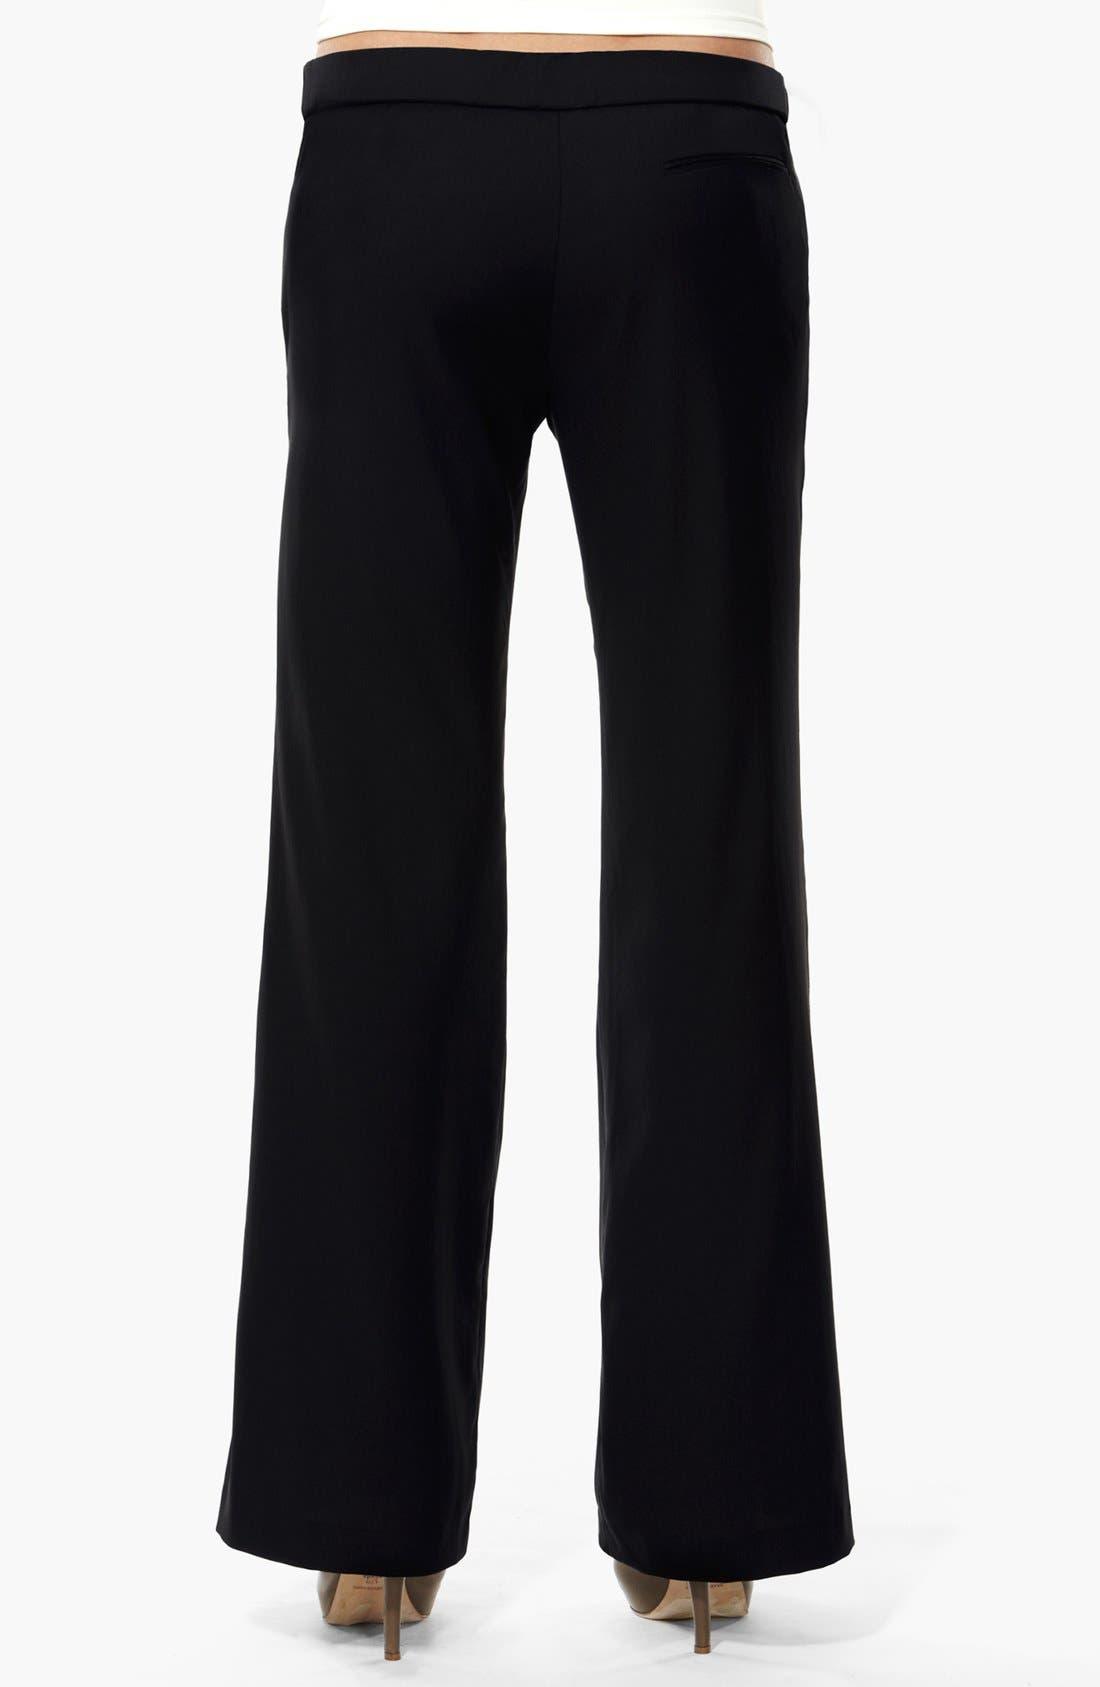 London 'Morgan' Tailored Maternity Pants,                             Alternate thumbnail 2, color,                             001